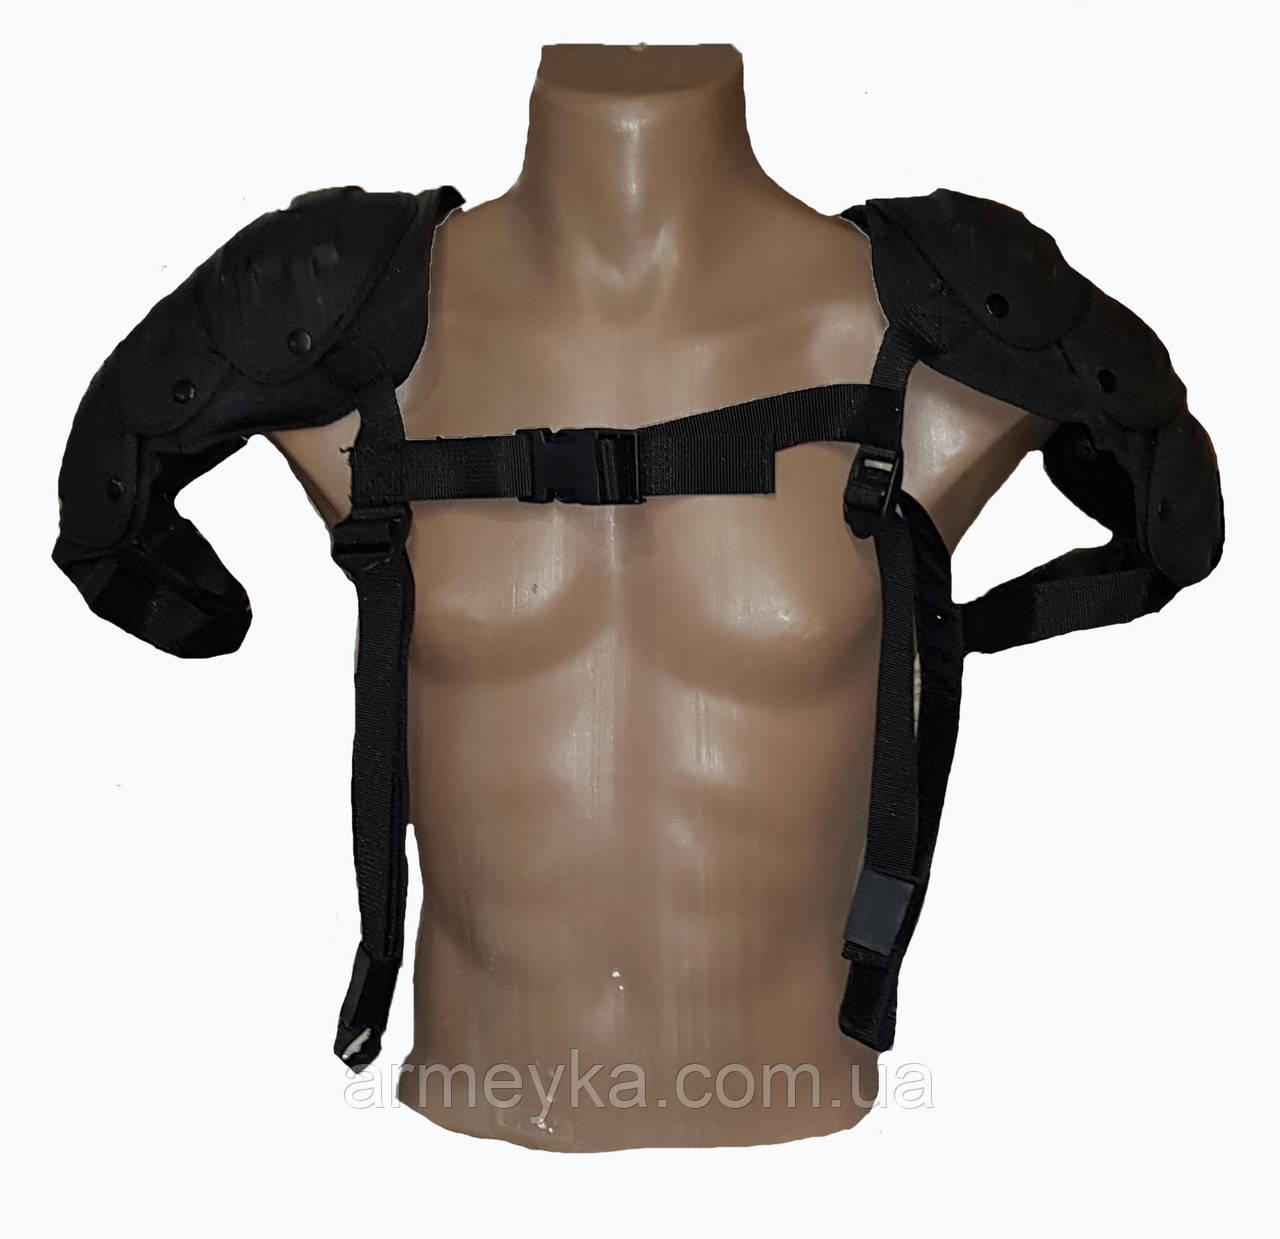 Баллистическая защита Protecop shoulder protection (основа). Франция, оригинал.